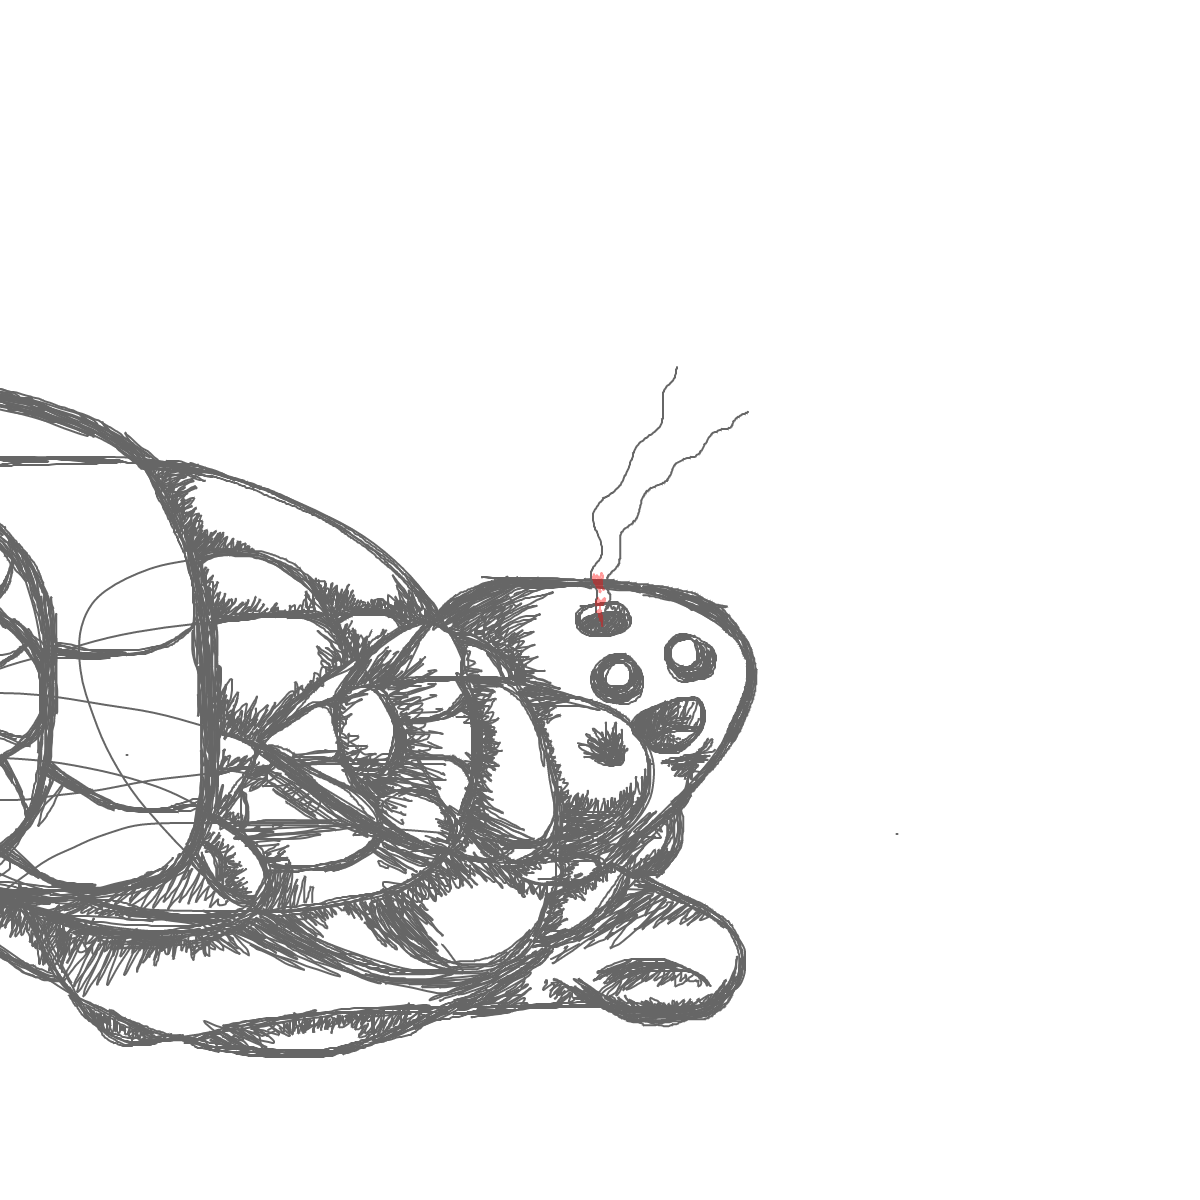 BAAAM drawing#7503 lat:42.8566741943359400lng: -2.7166697978973390